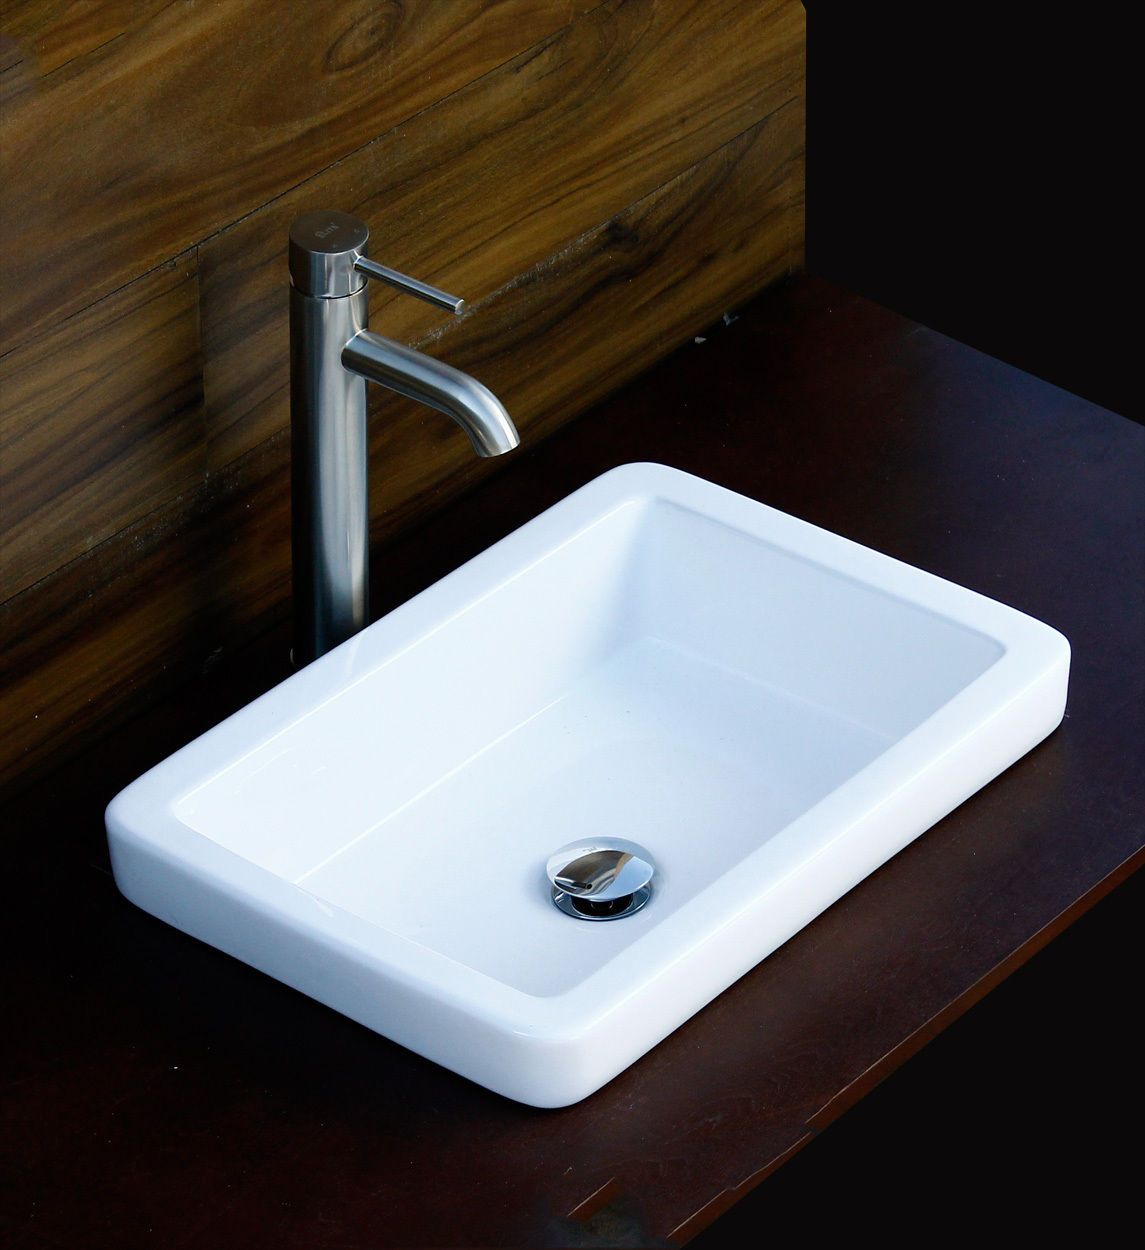 Bathroom Sr 7444 L03 Semi Recessed Ceramic Vessel Sink With Nickel